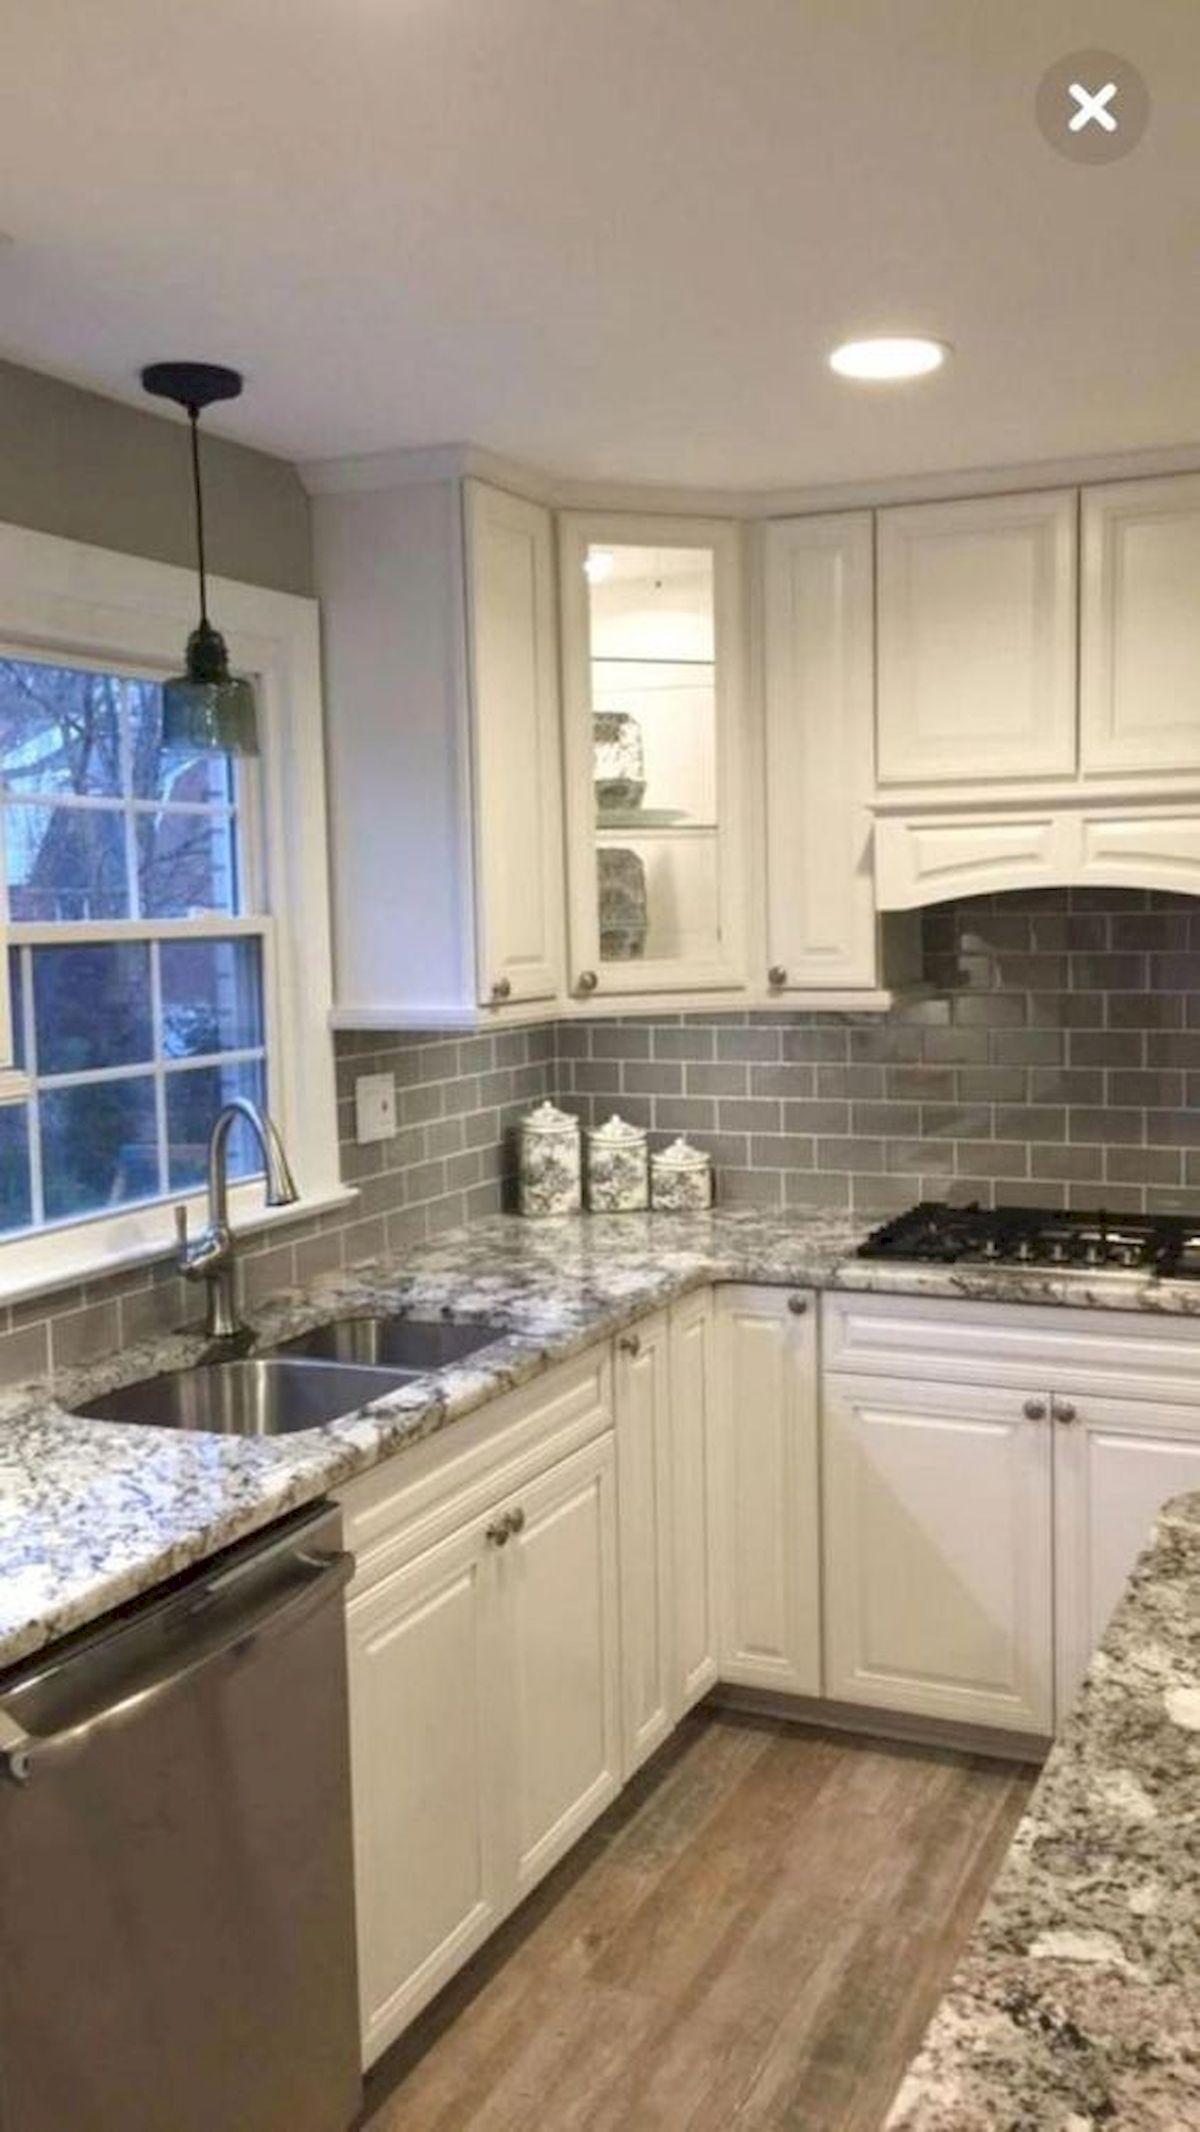 45 Easy Kitchen Decor and Design Ideas (2)